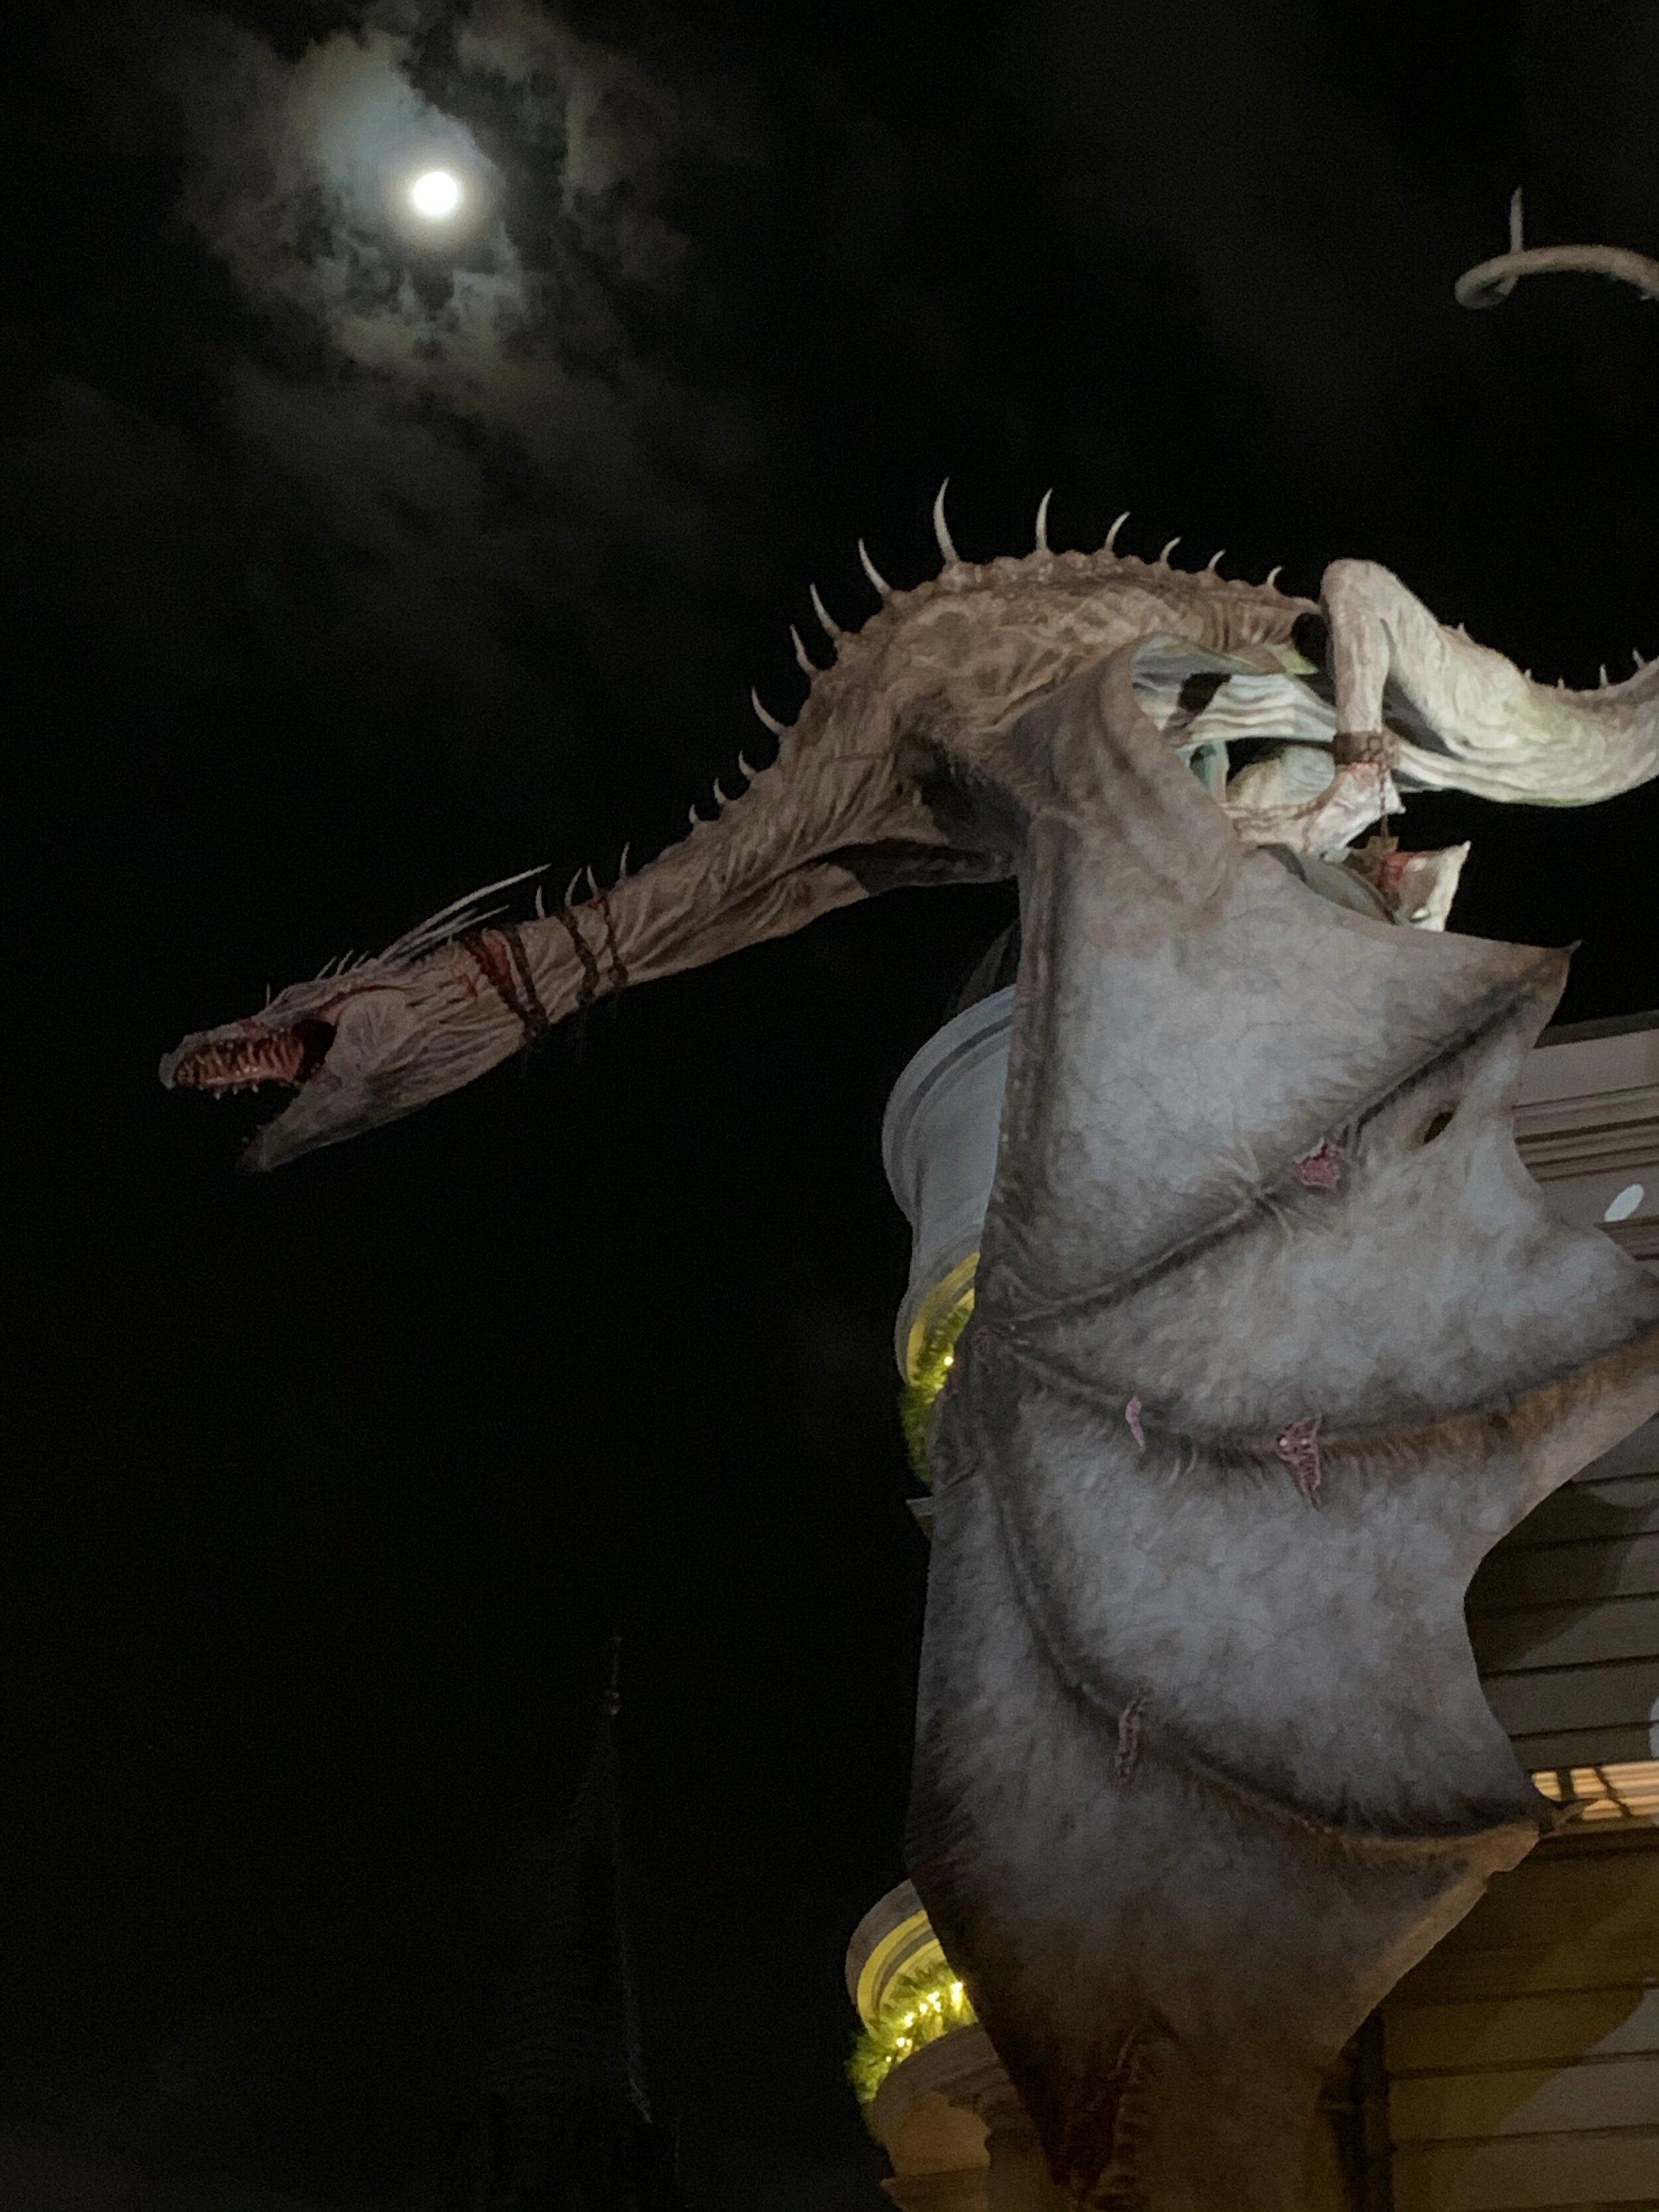 Dragon perched on top of Gringott's